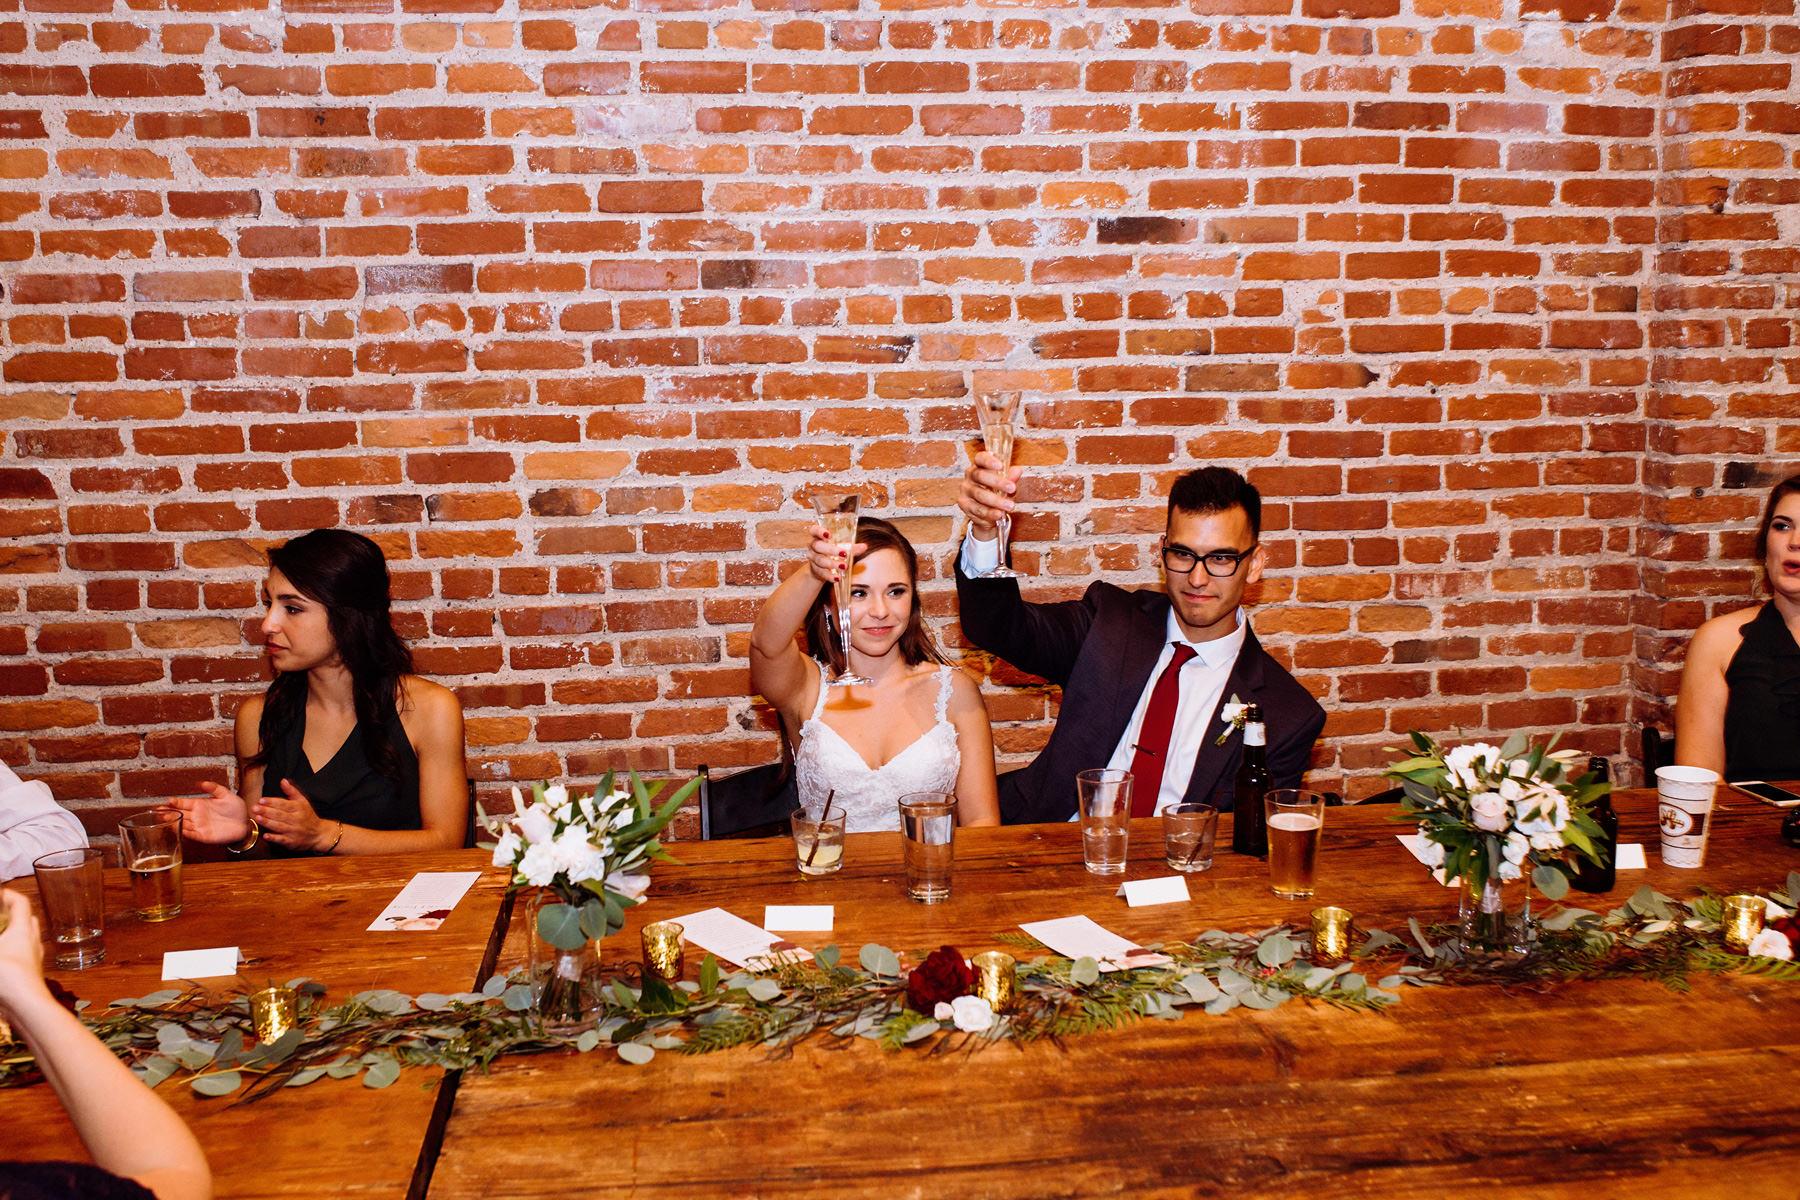 Kansas City Summer Wedding at the Guild_Kindling Wedding Photography Blog72.JPG